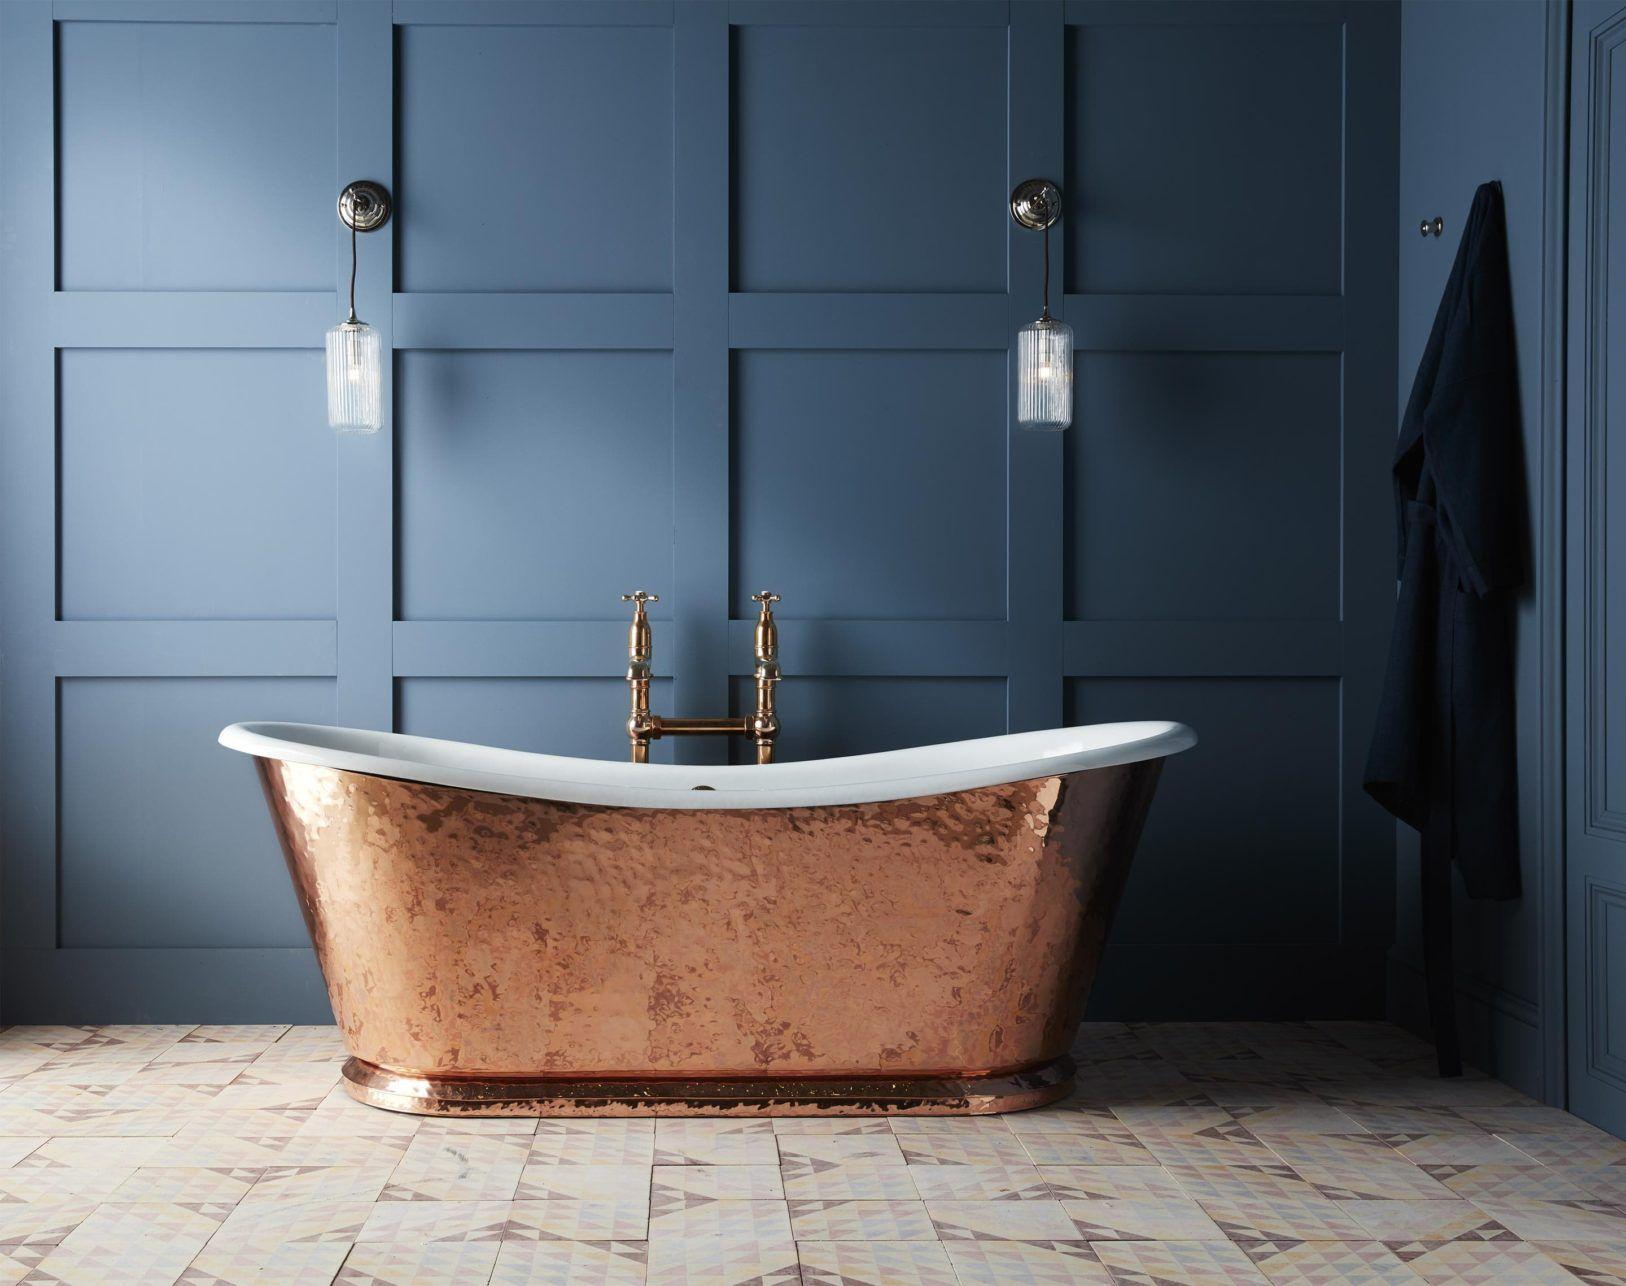 Photo of Copper bathroom